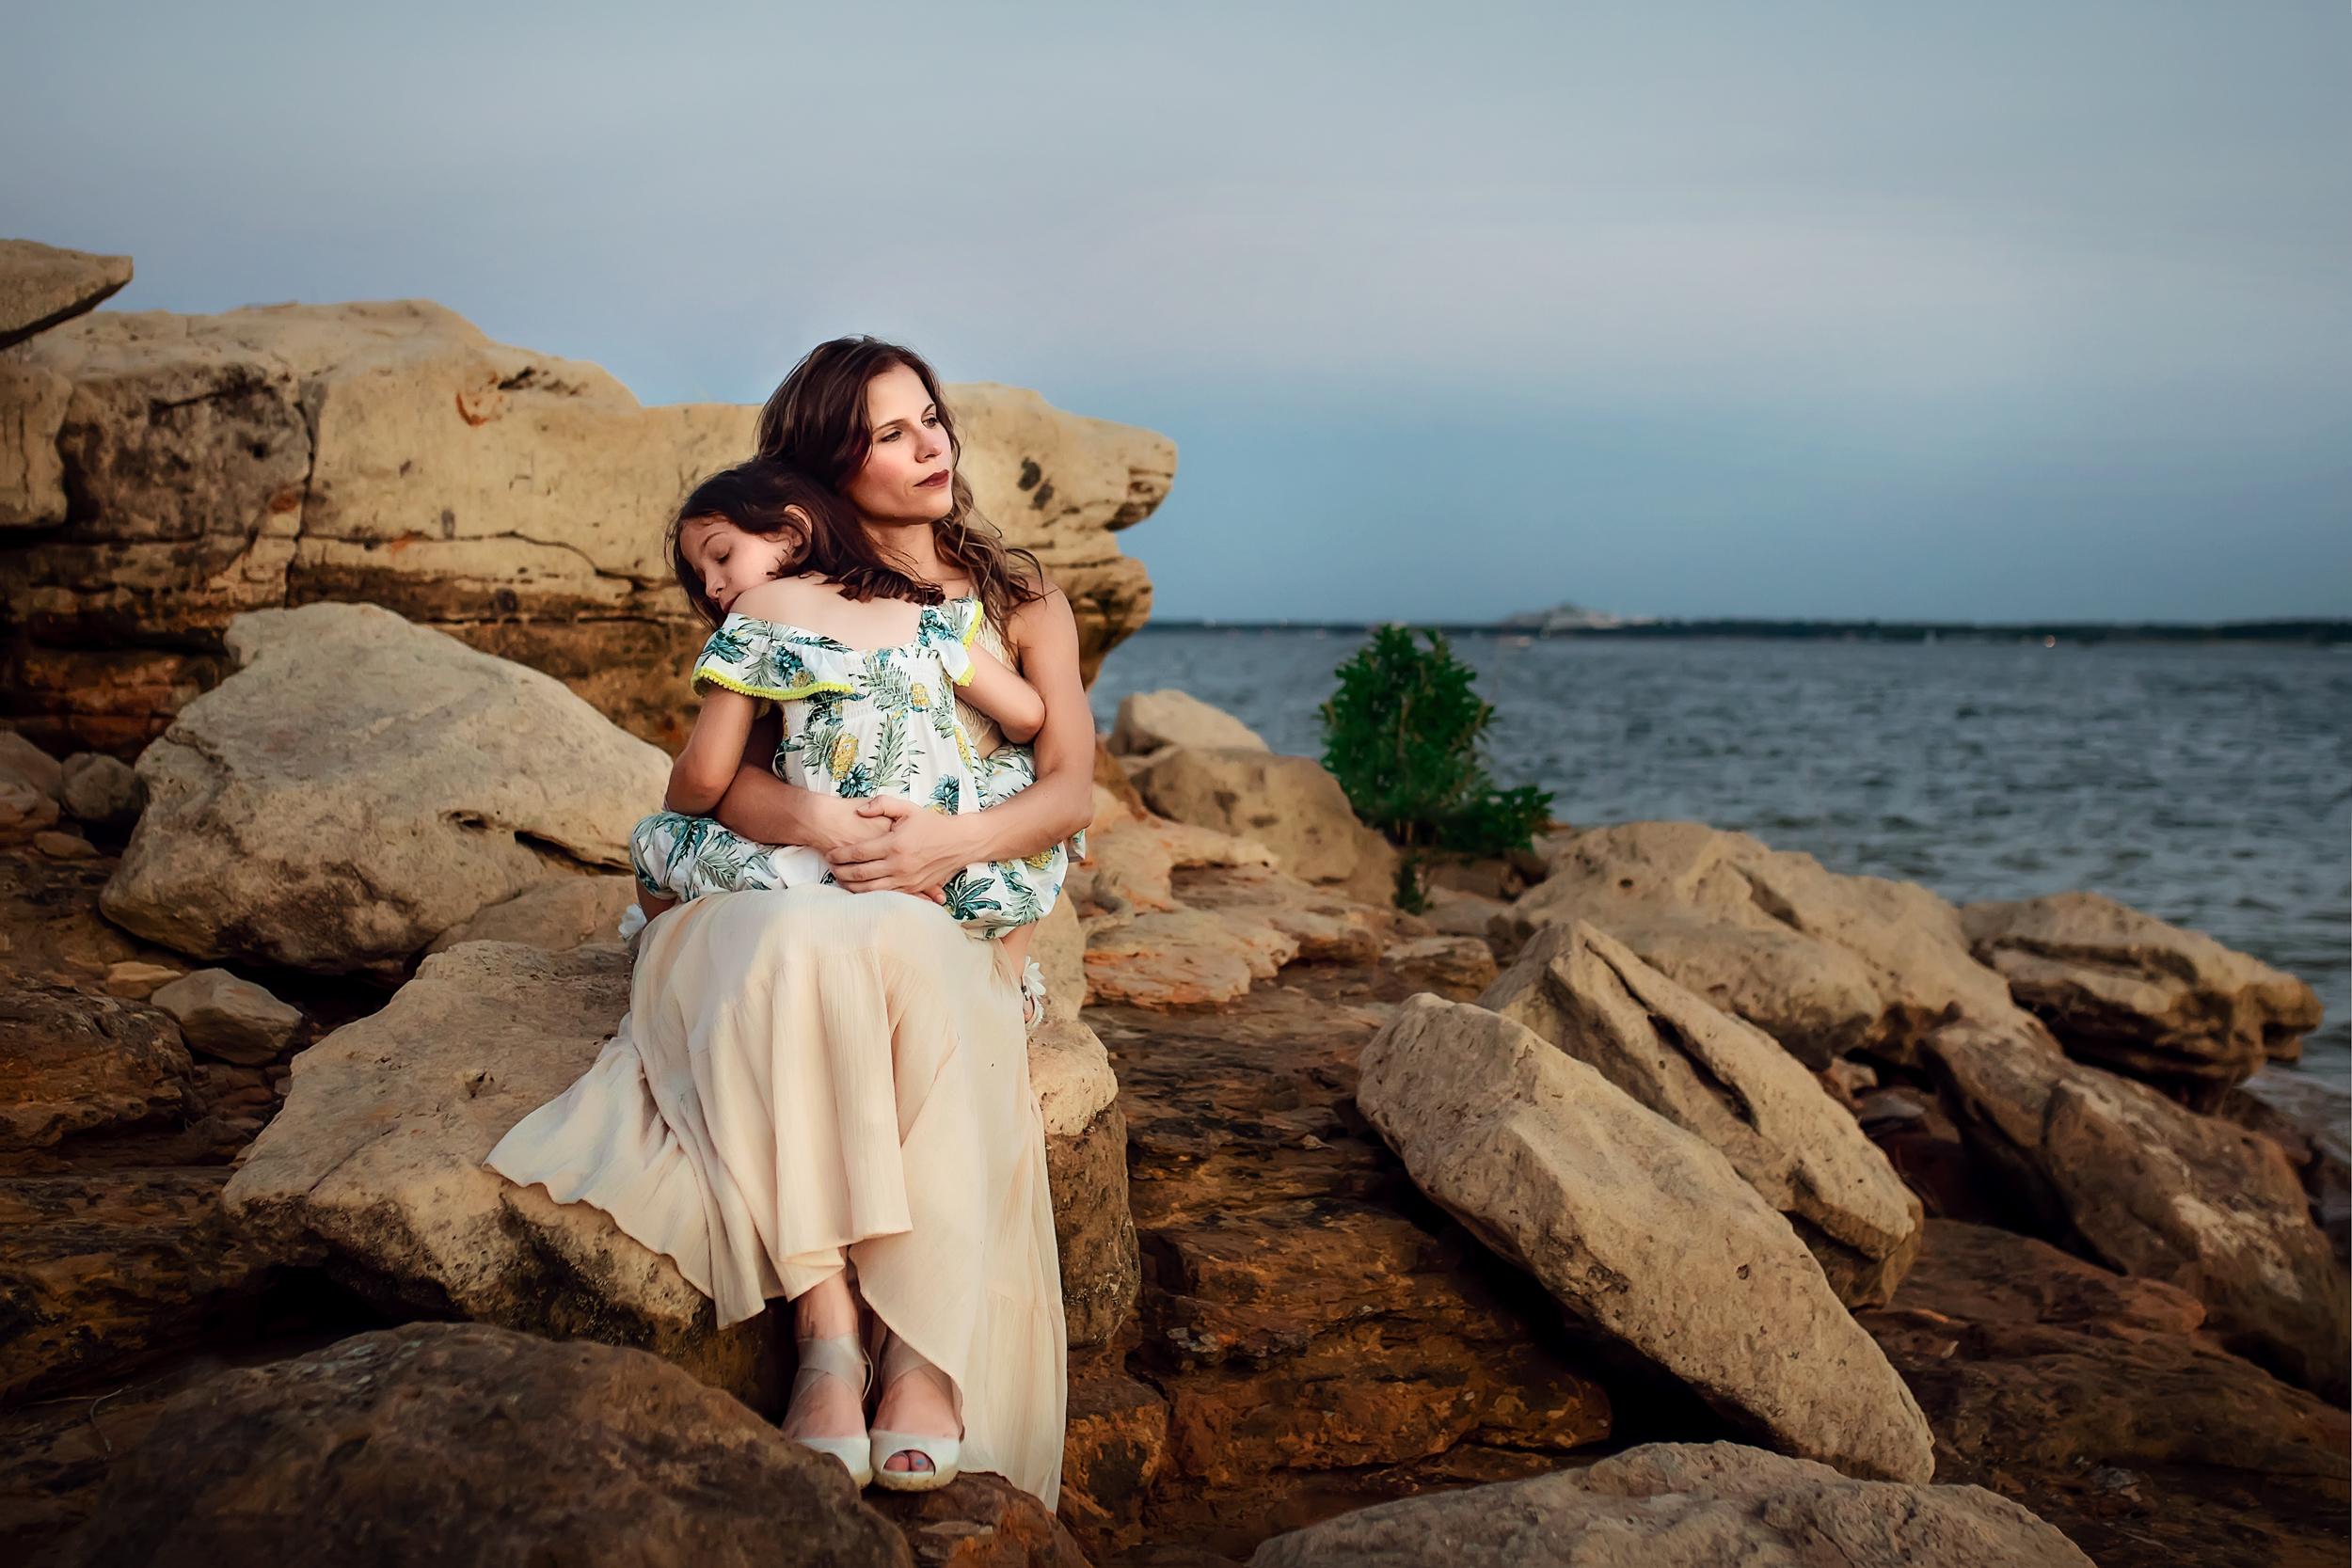 Dallas lifestyle photographer Stacie Dugas - emotive